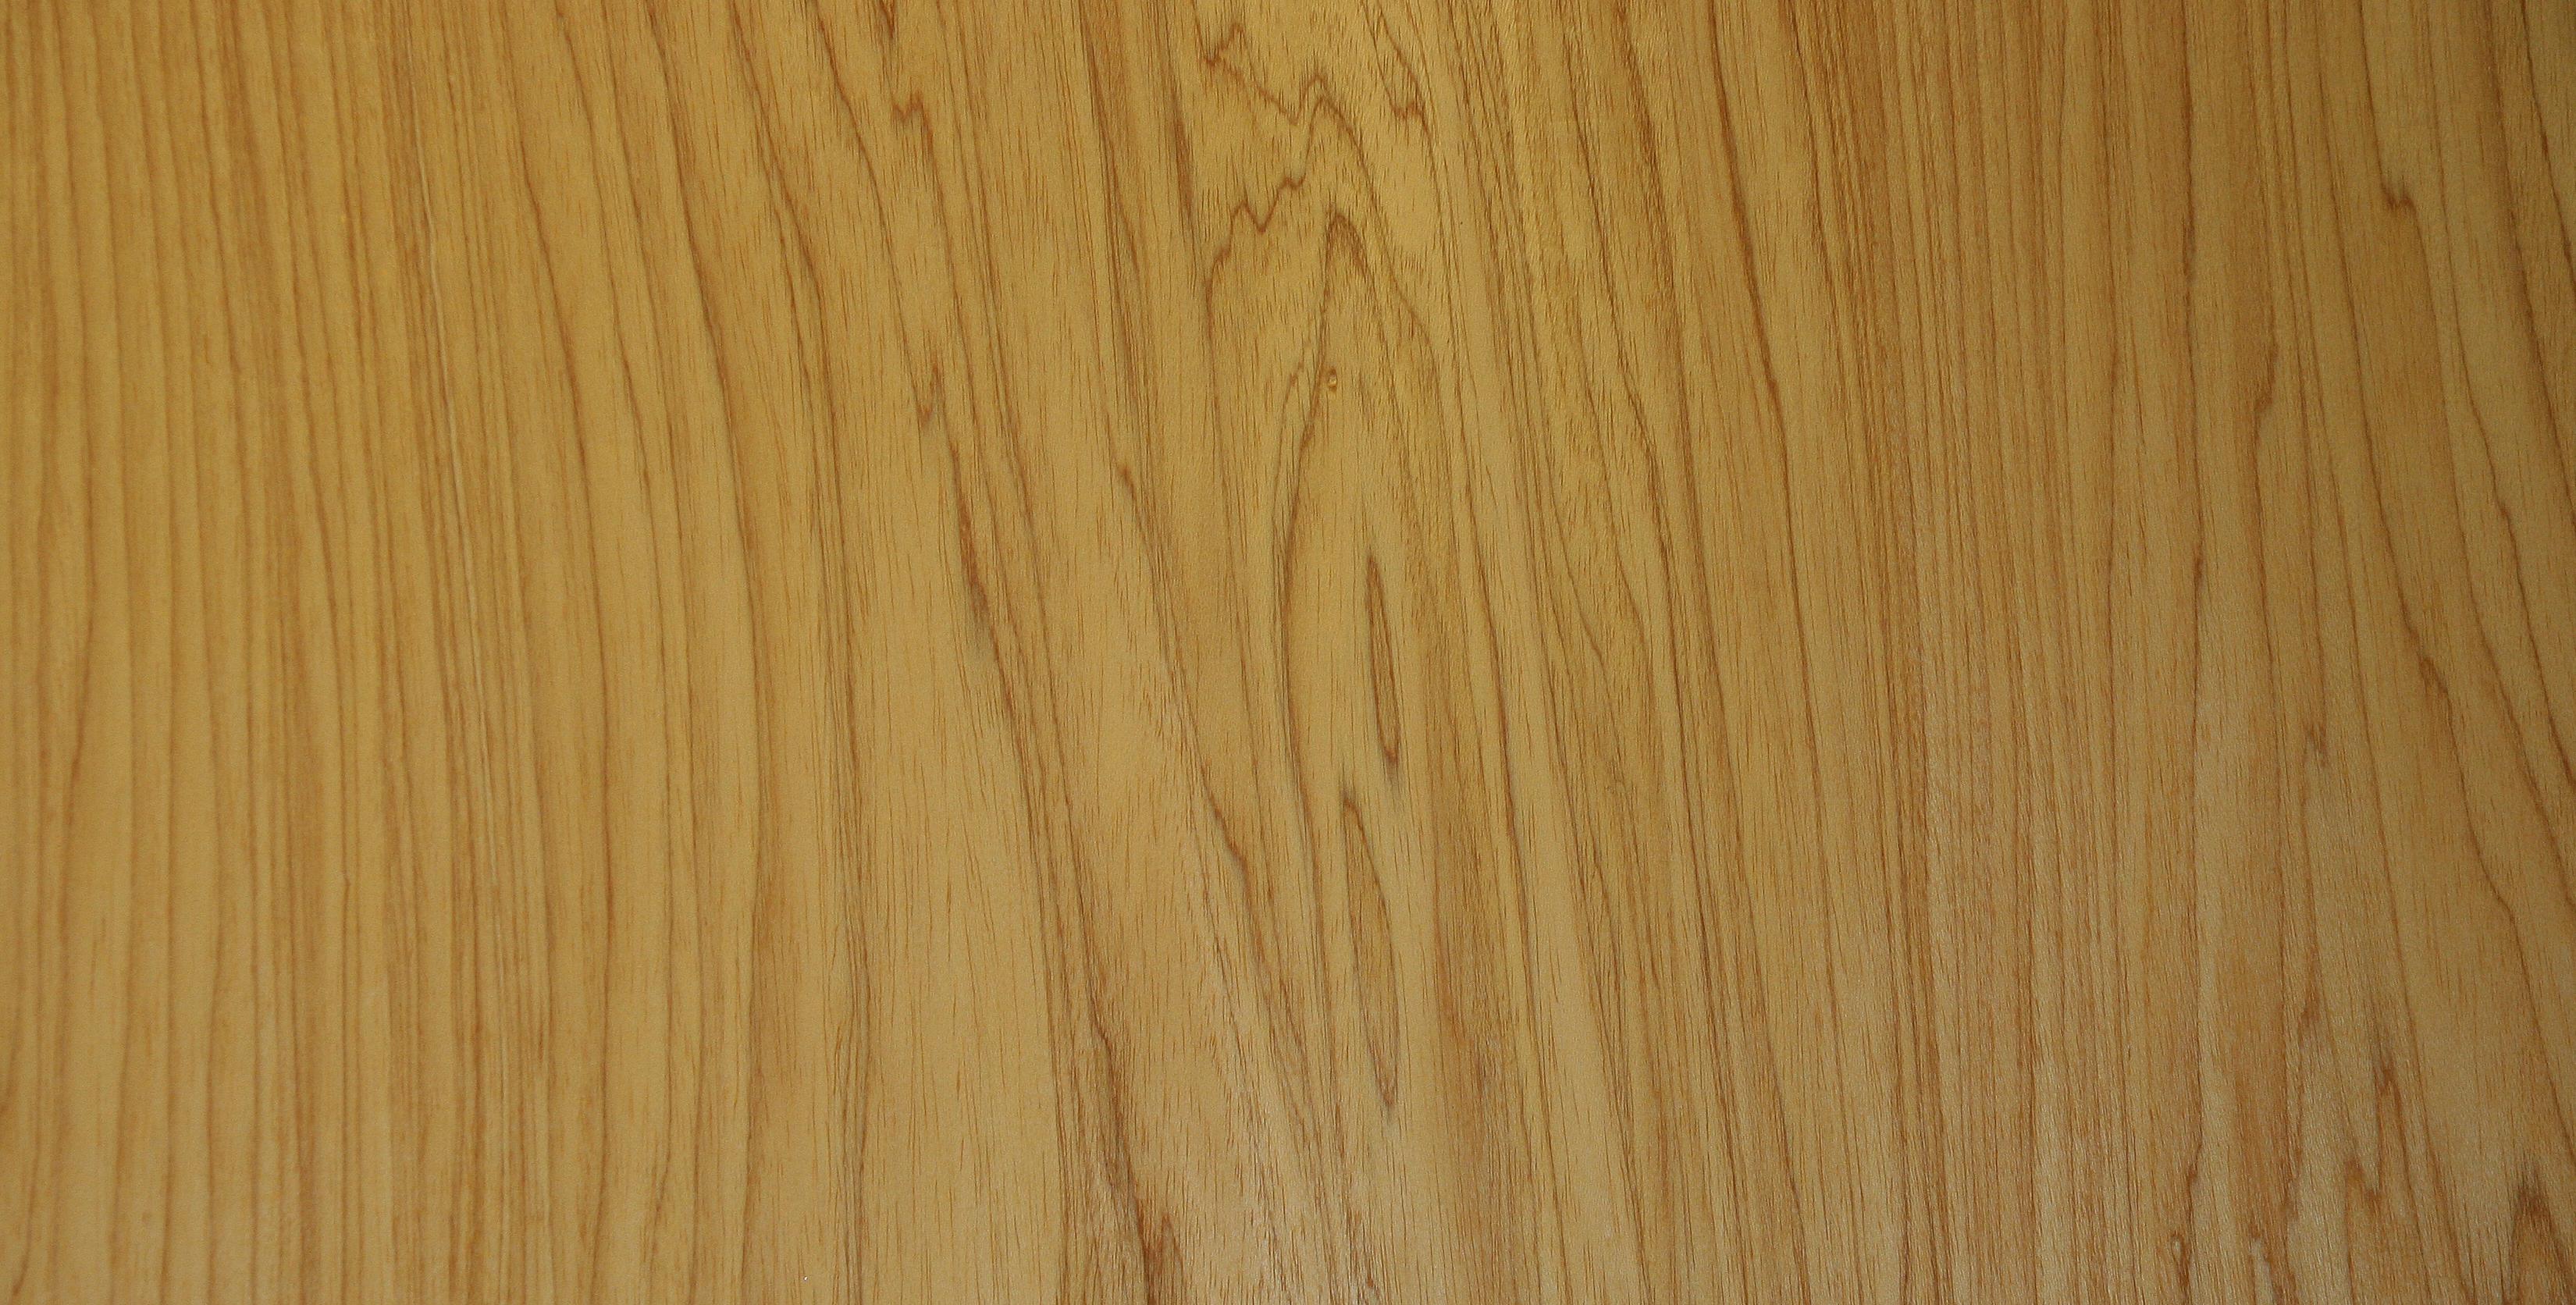 Wood Grain by Hatch1921